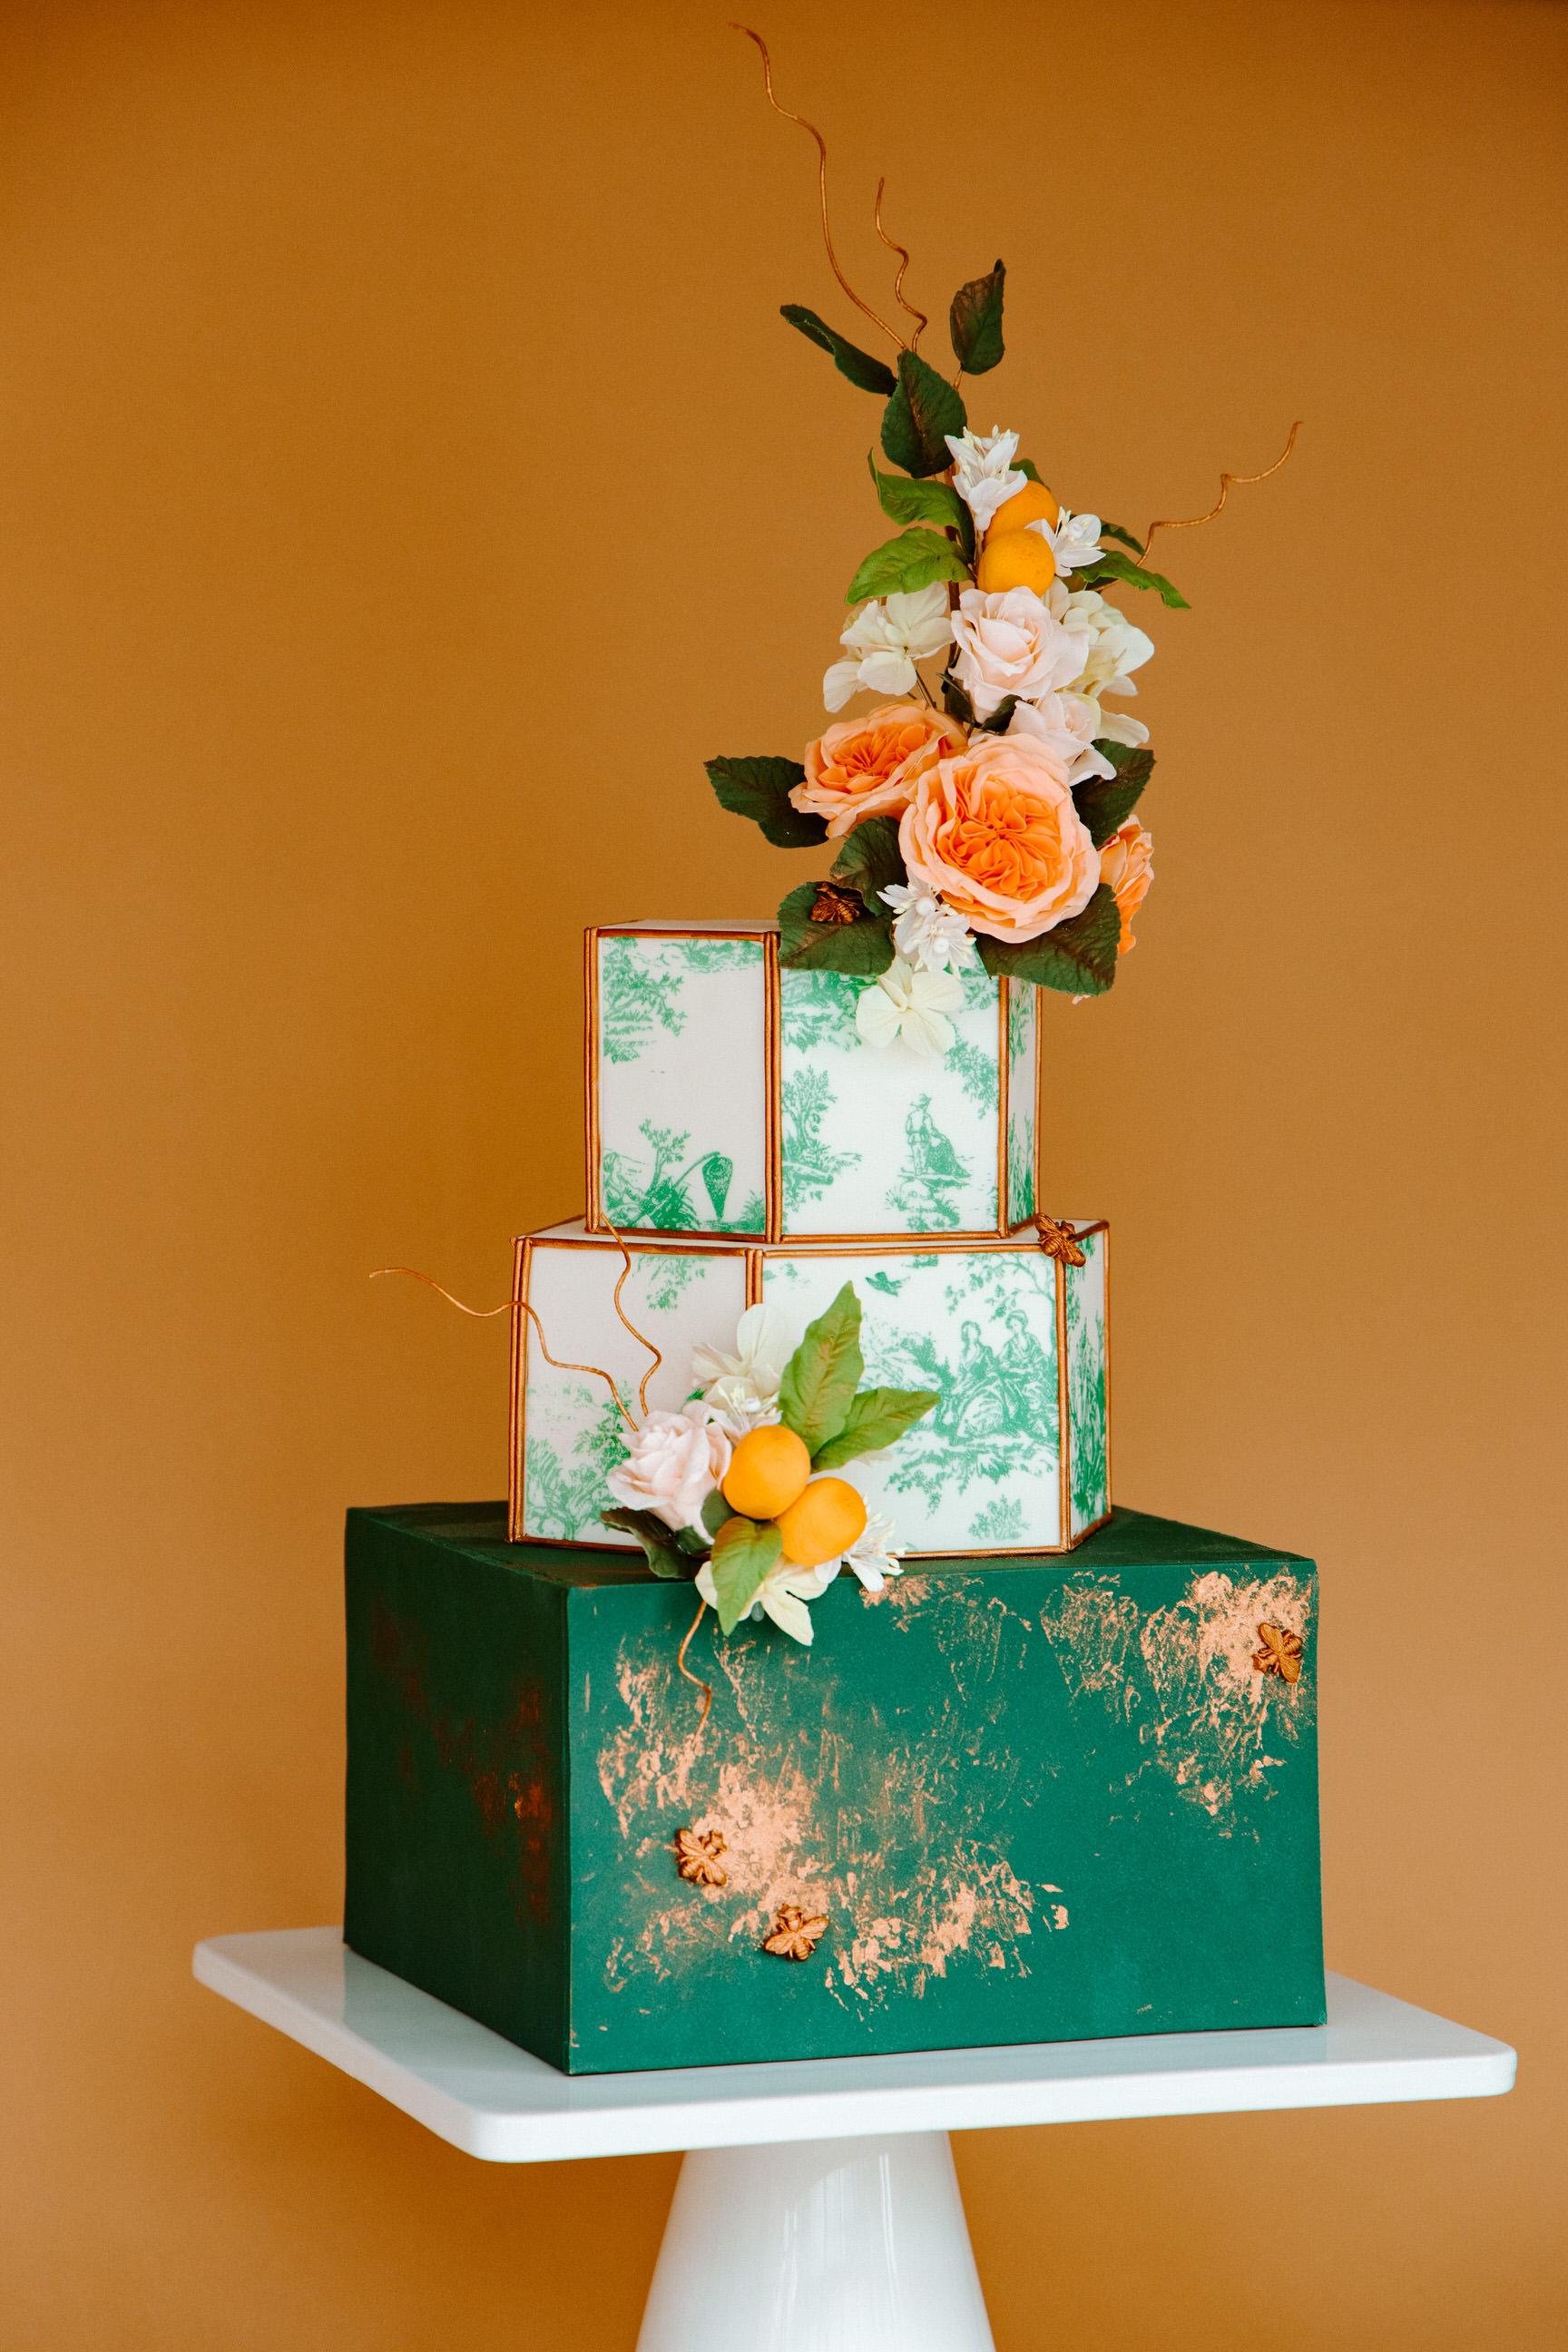 gateaux-cake-7437.jpg